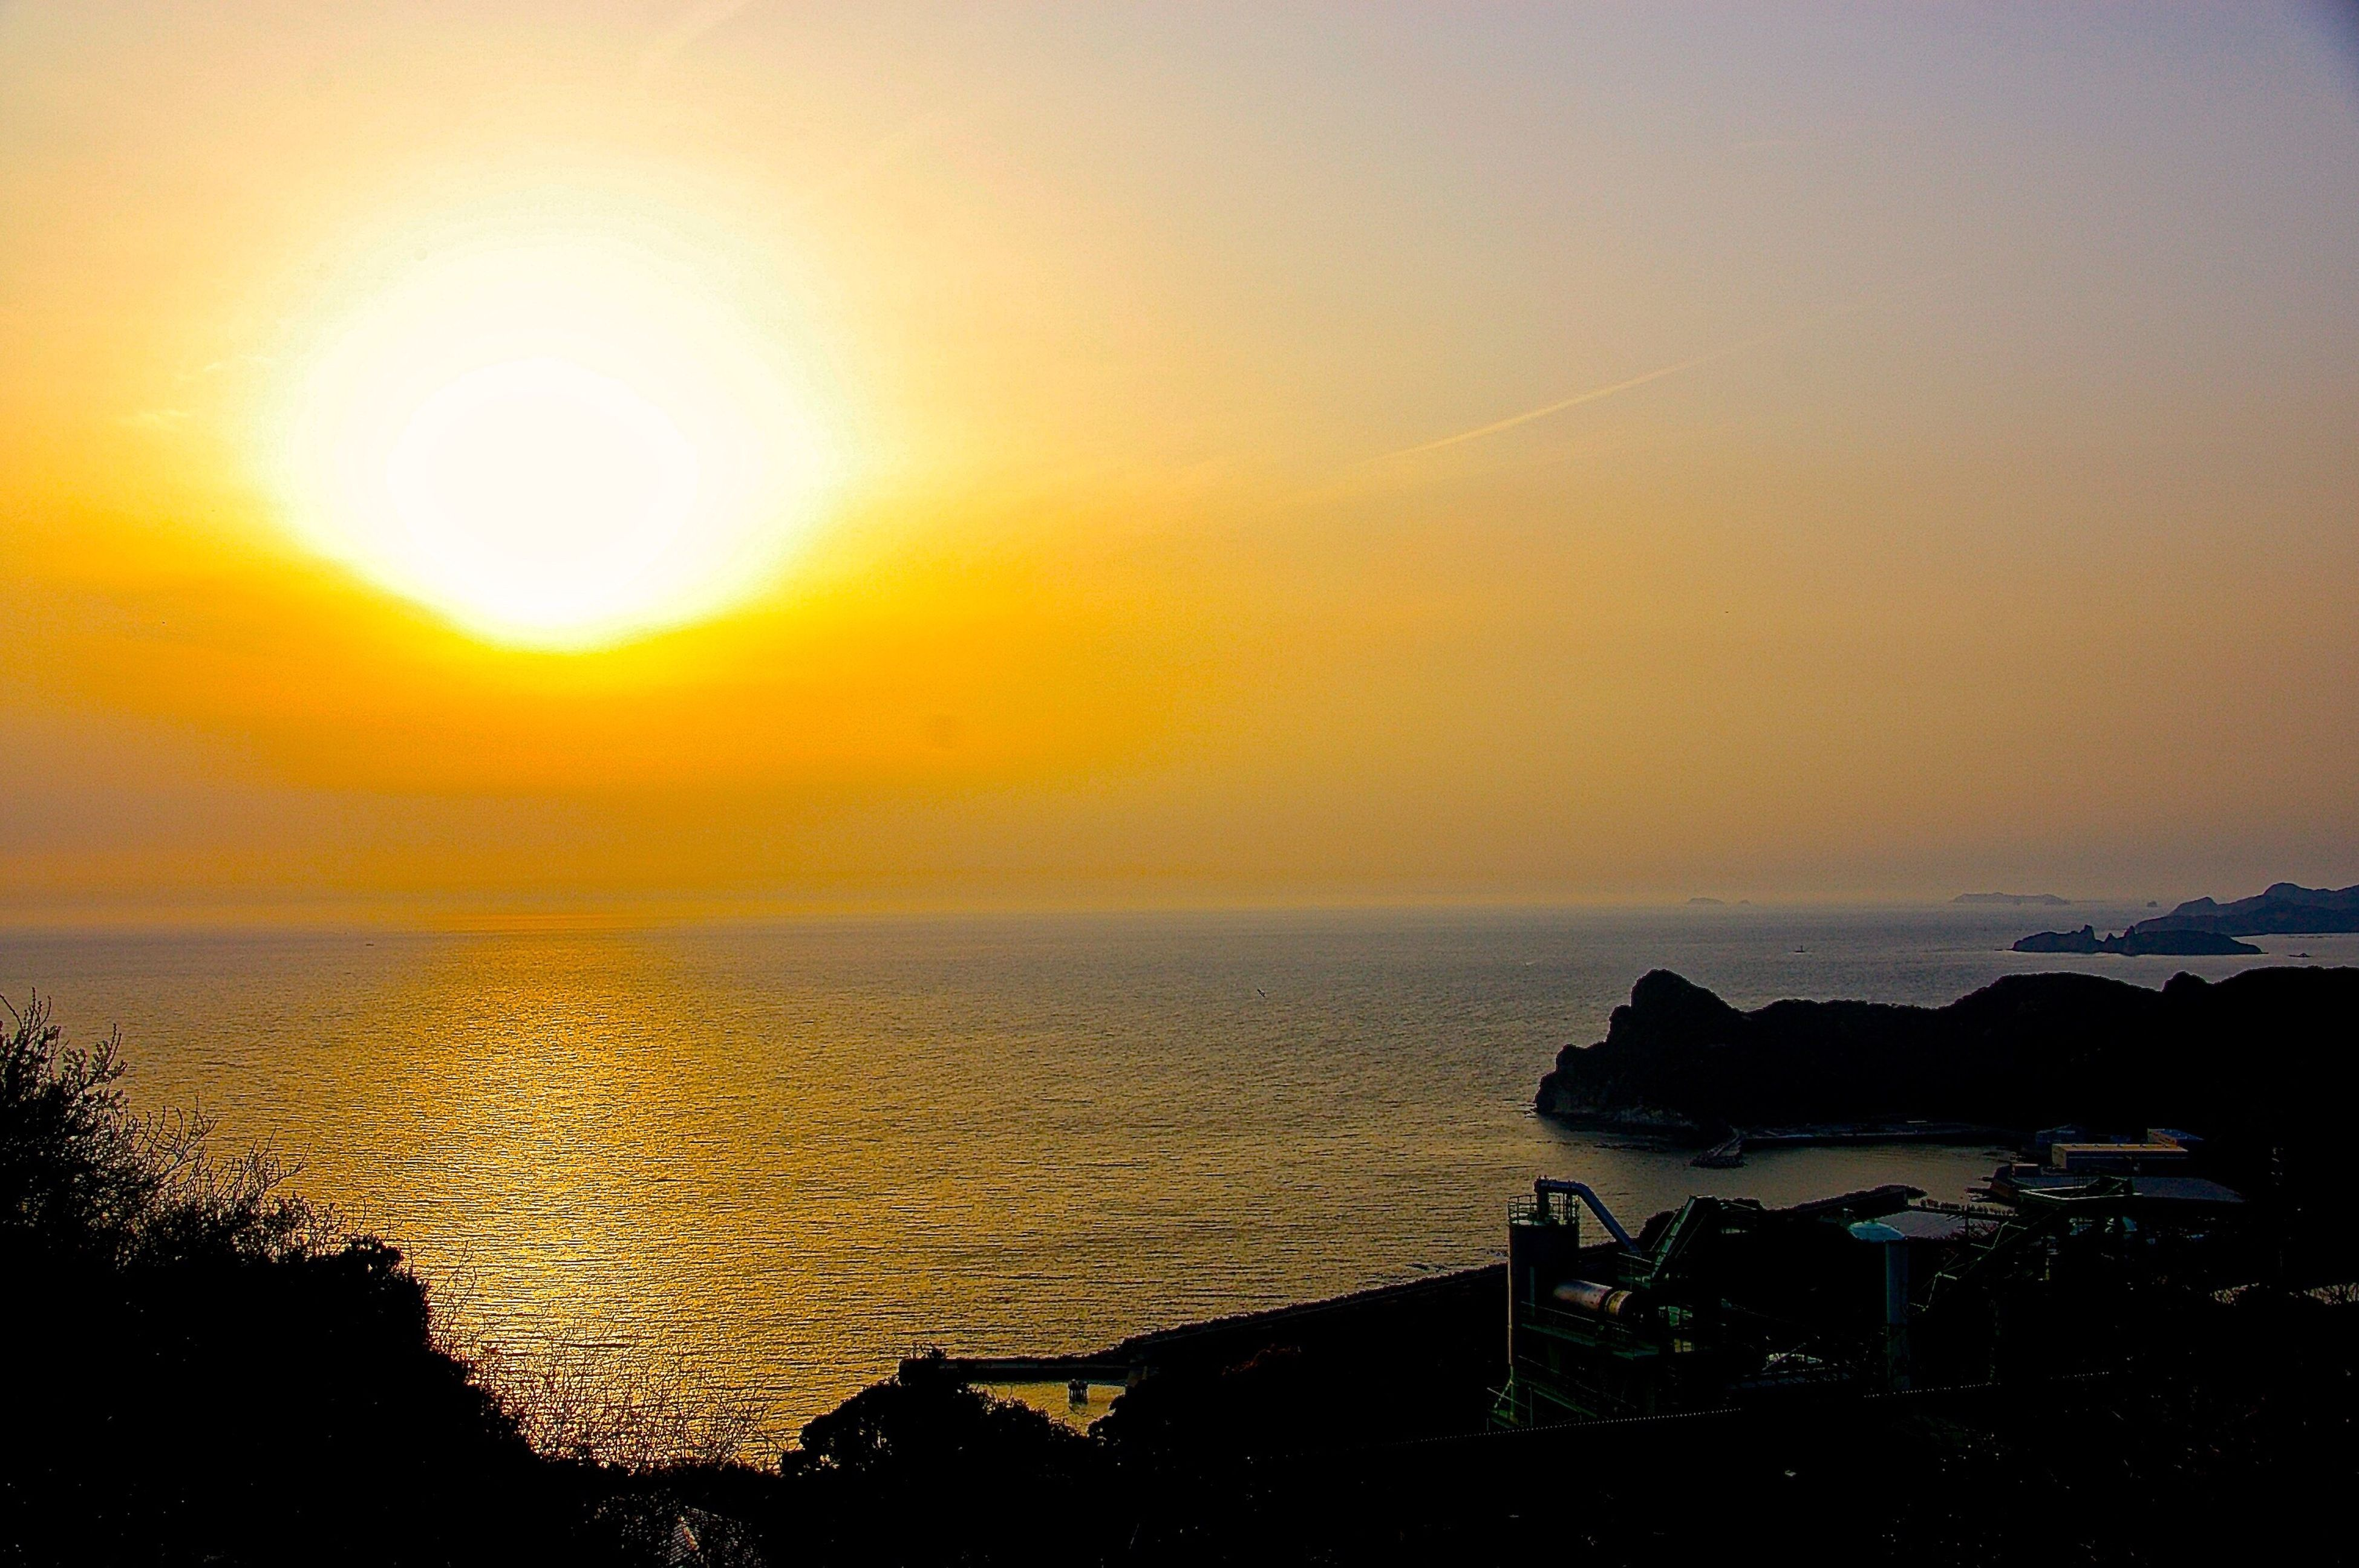 sunset, sun, sea, horizon over water, water, scenics, tranquil scene, orange color, beauty in nature, tranquility, sky, idyllic, nature, shore, sunlight, lens flare, sunbeam, outdoors, remote, no people, coastline, non-urban scene, bright, ocean, landscape